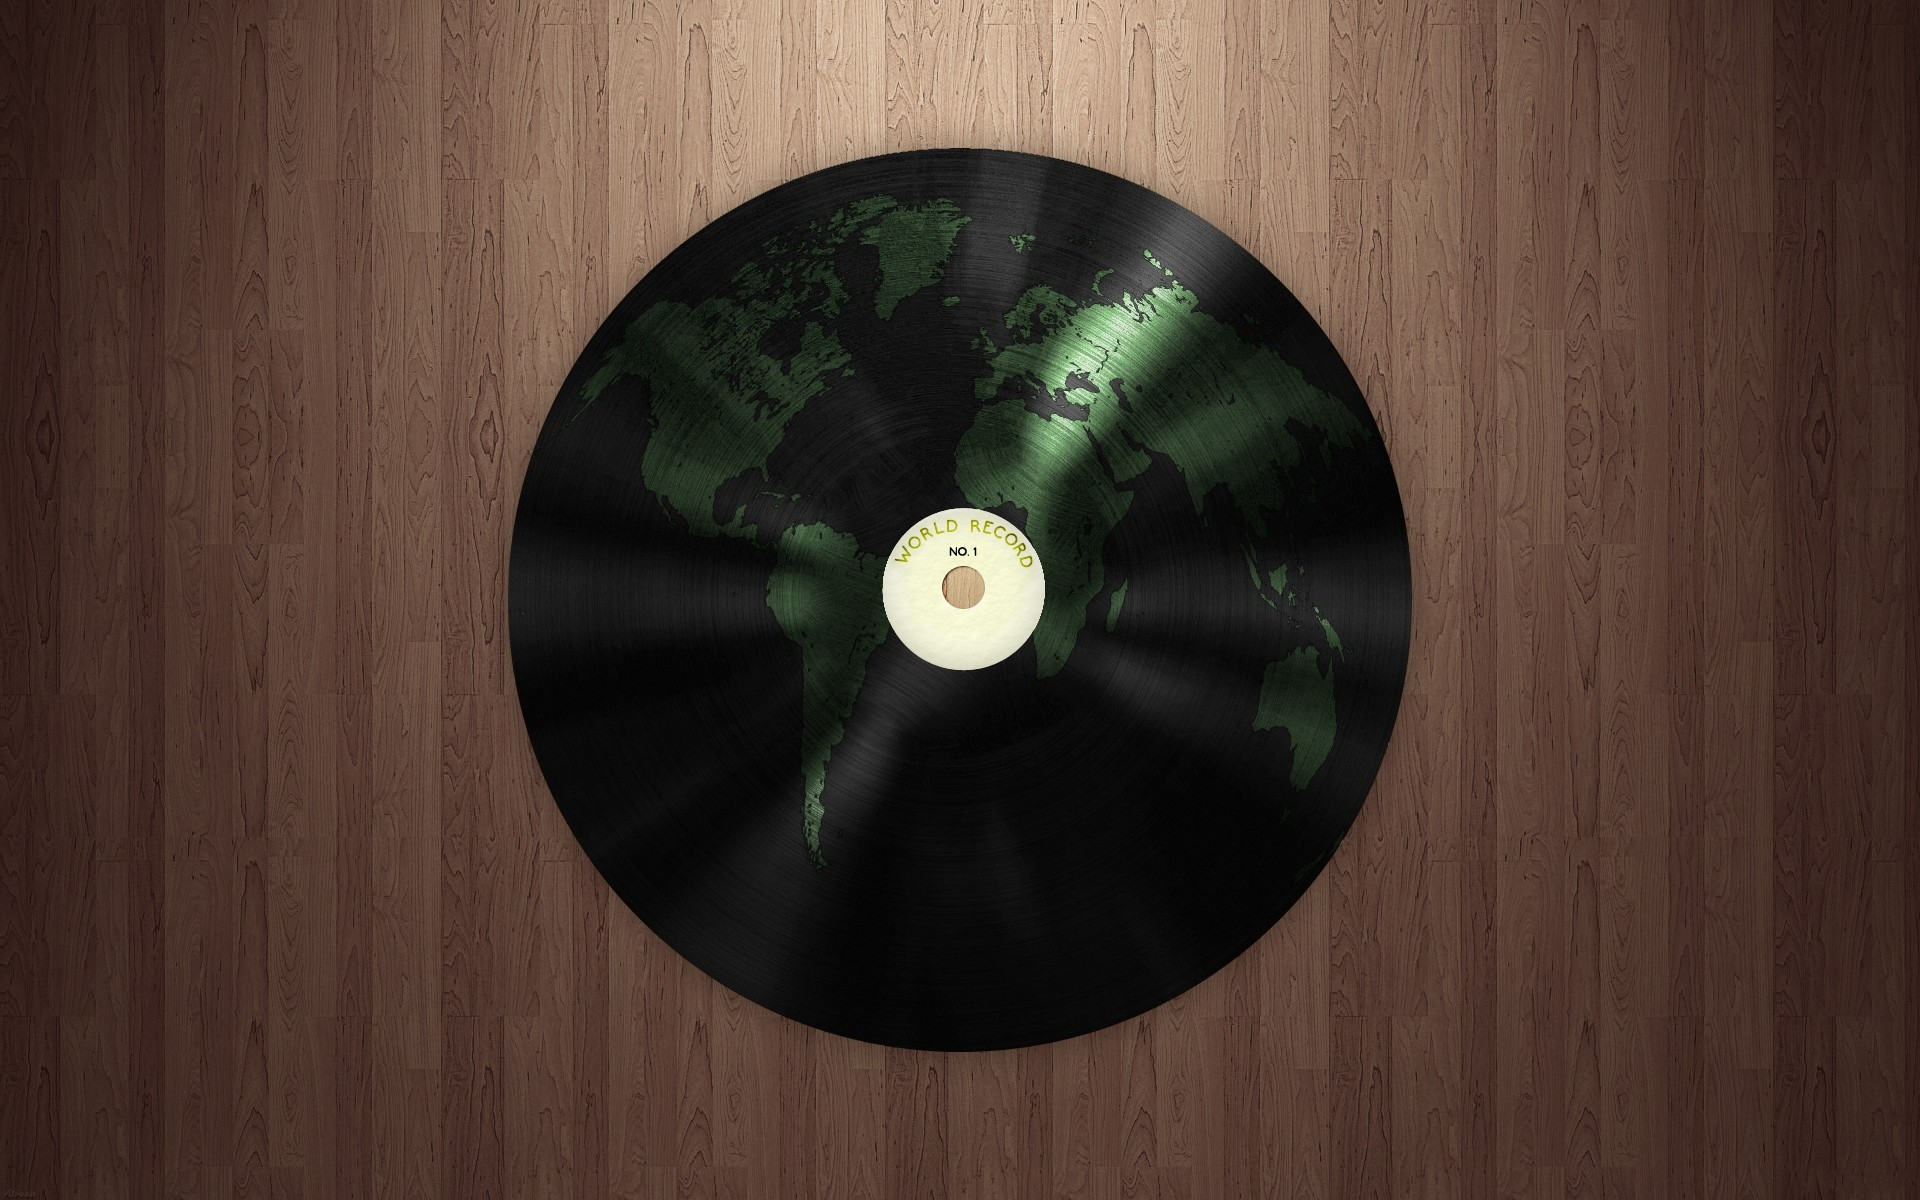 World Record Wallpaper 1920x1200 World Record Vinyl 1920x1200